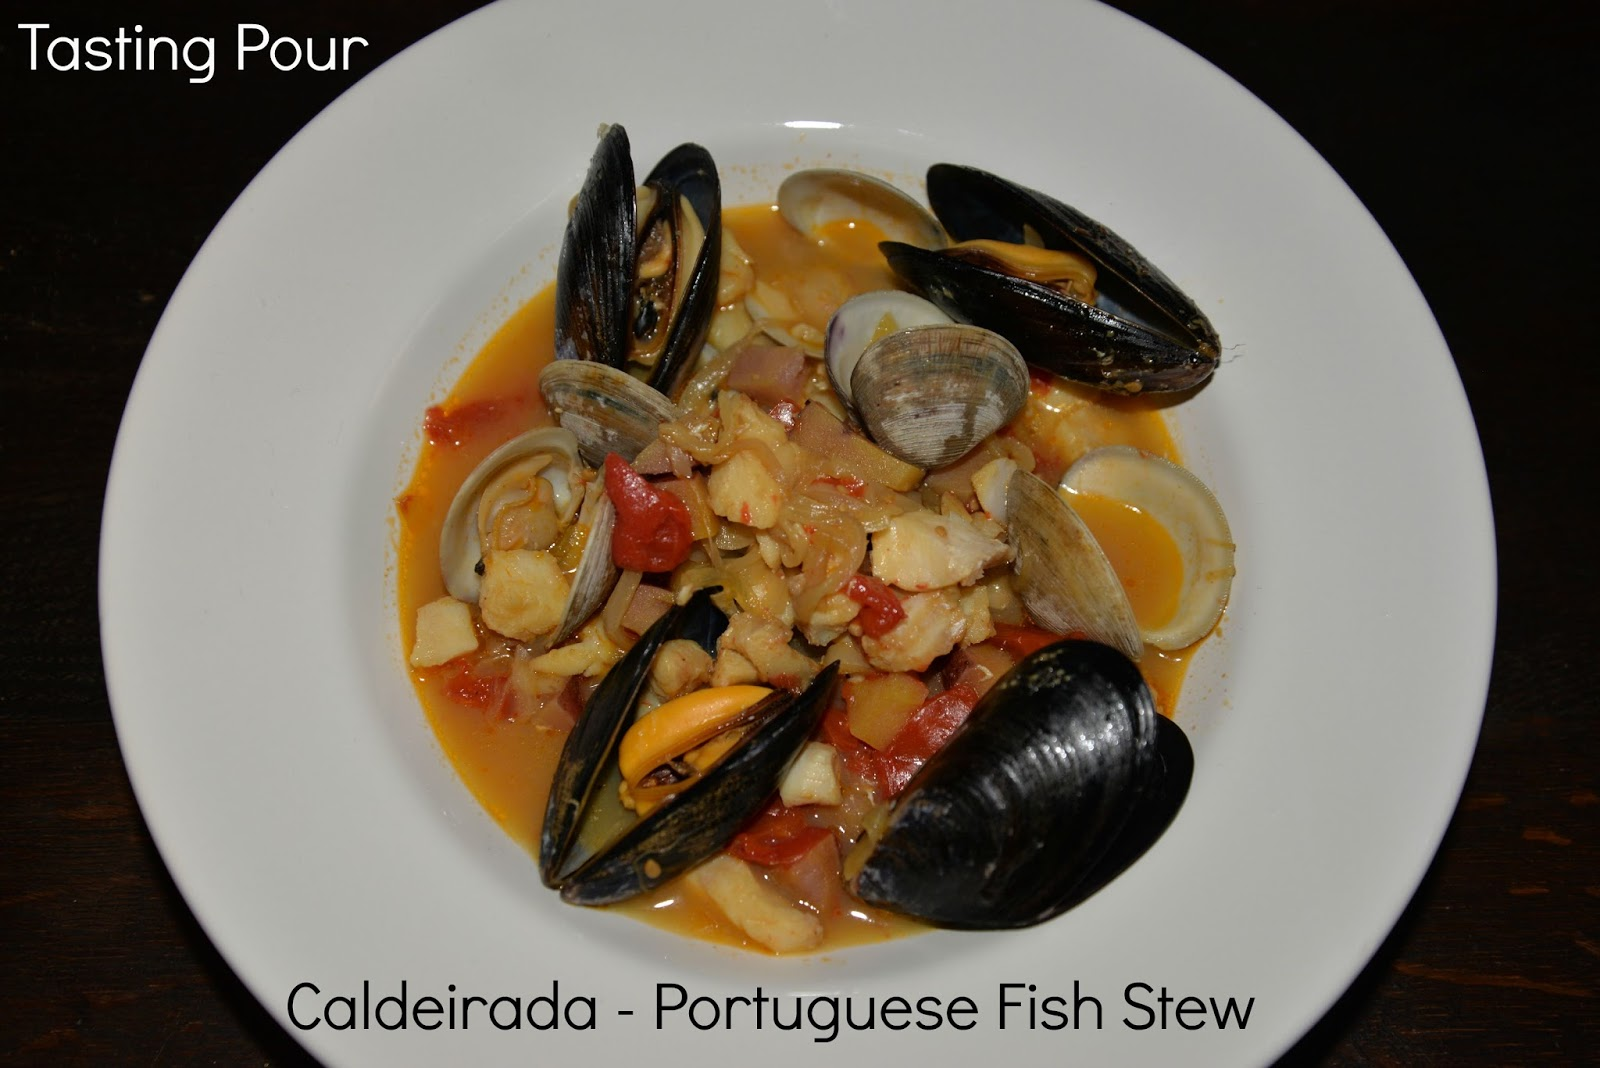 Caldeirada - Portuguese Fish Stew